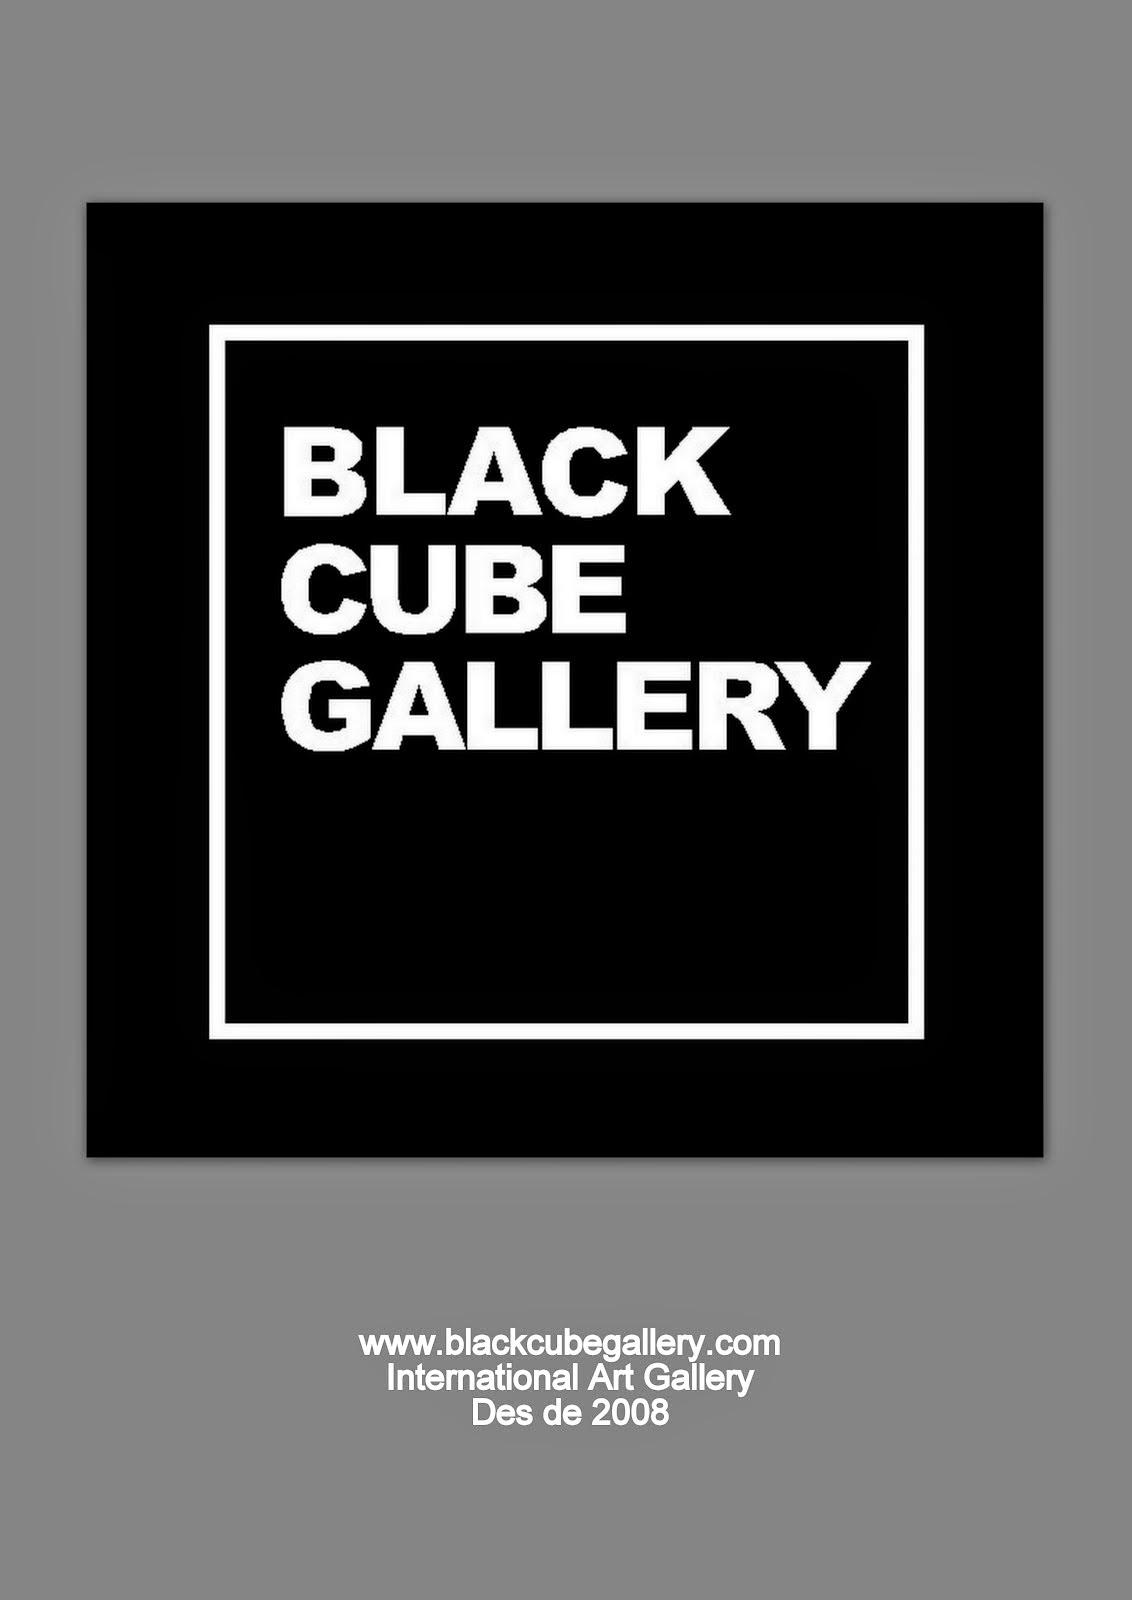 Black Cube Gallery